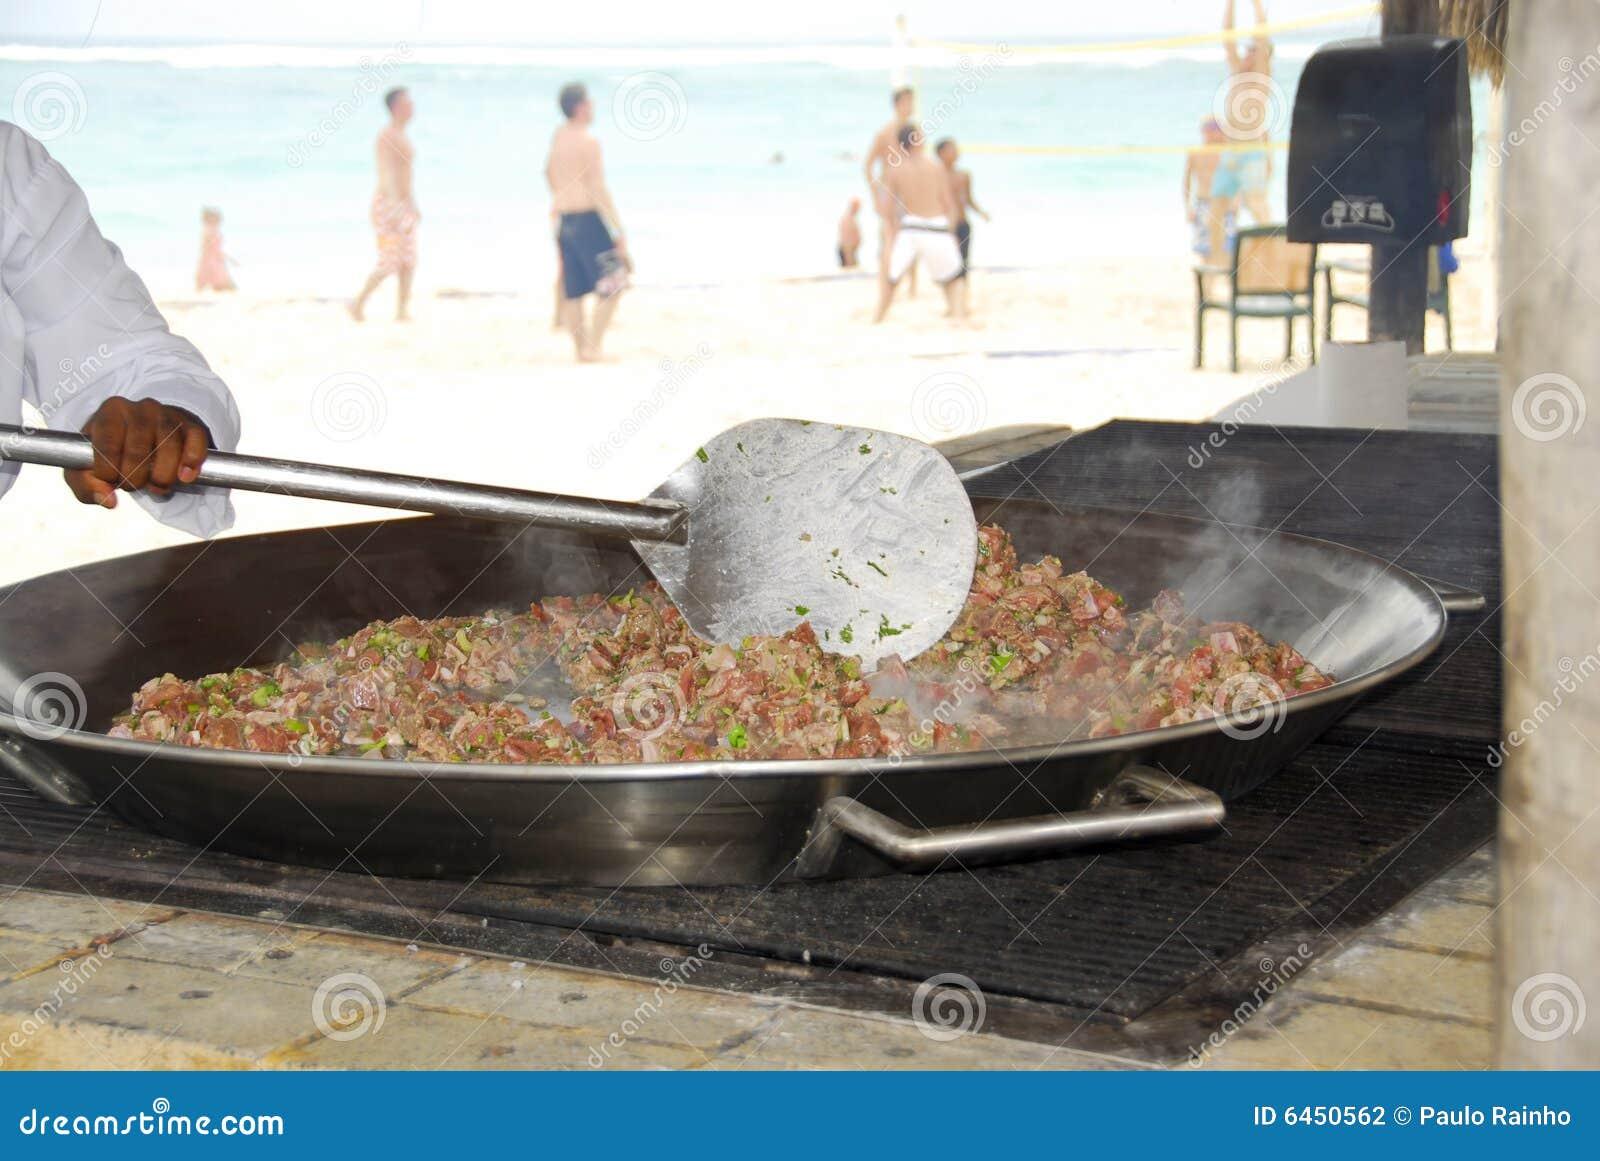 Paella owoce morza